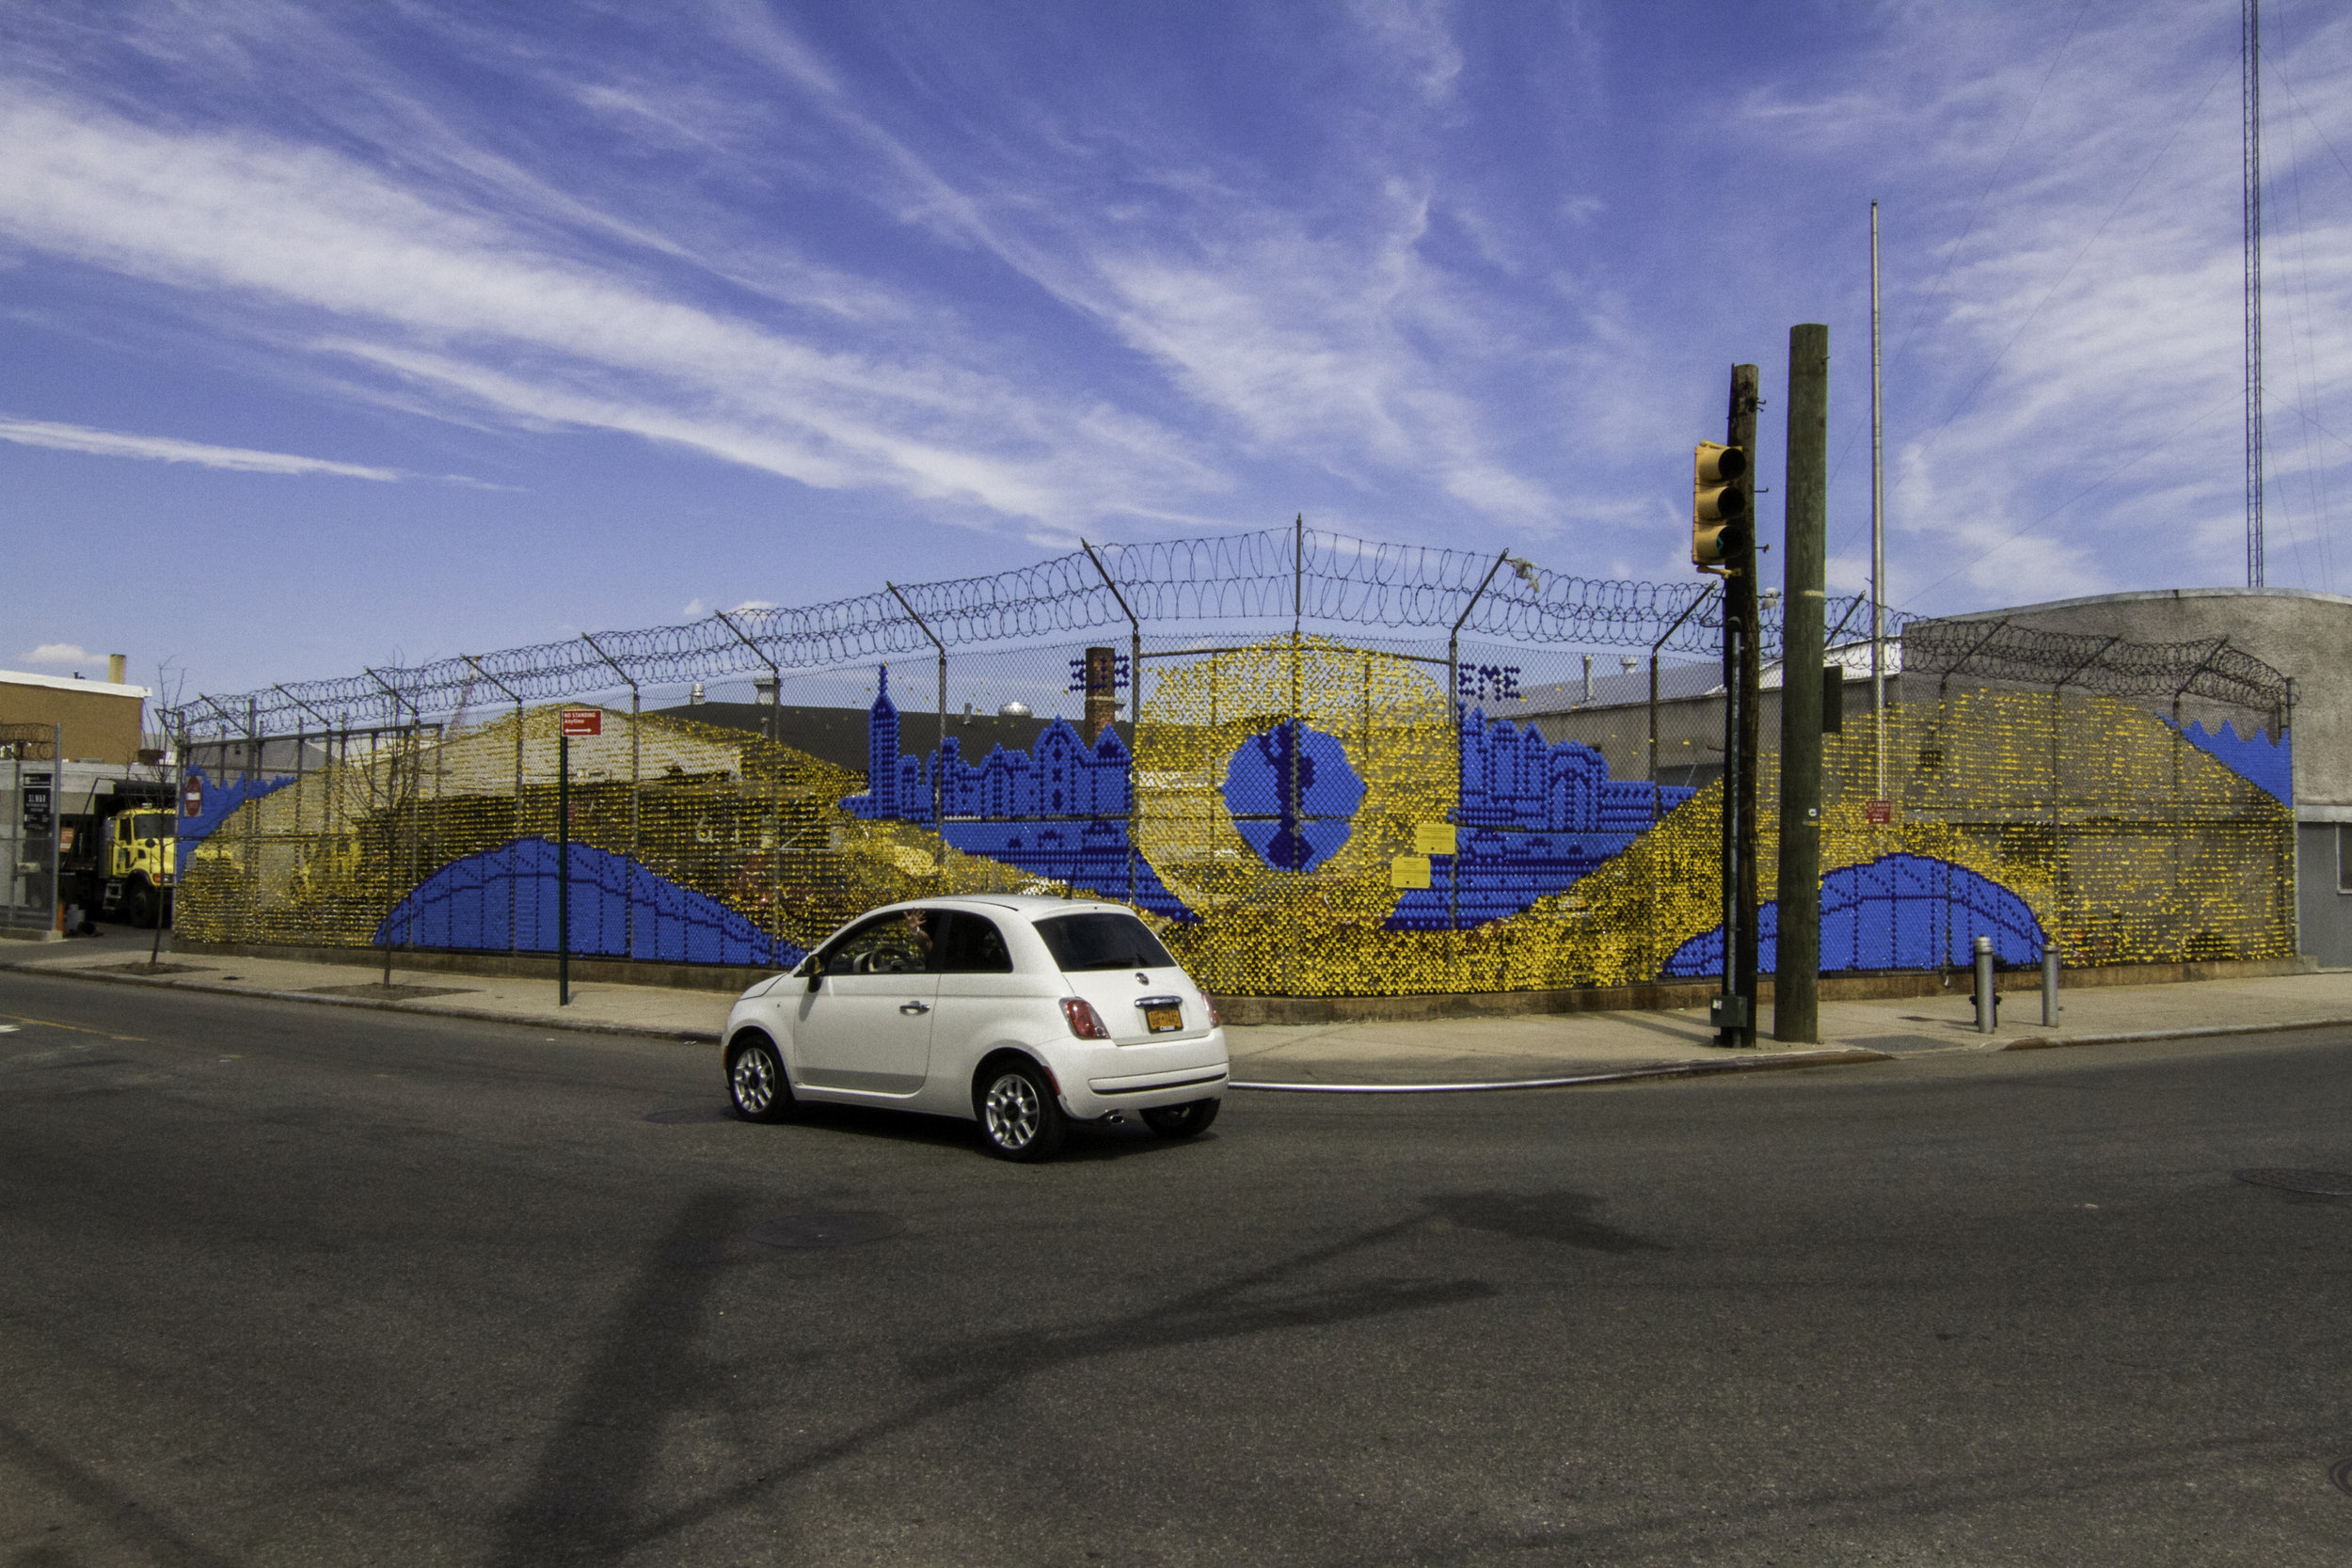 Mariposas Amarillas, Port Richmond, Staten Island - Lina Montoya and Project Urbanista